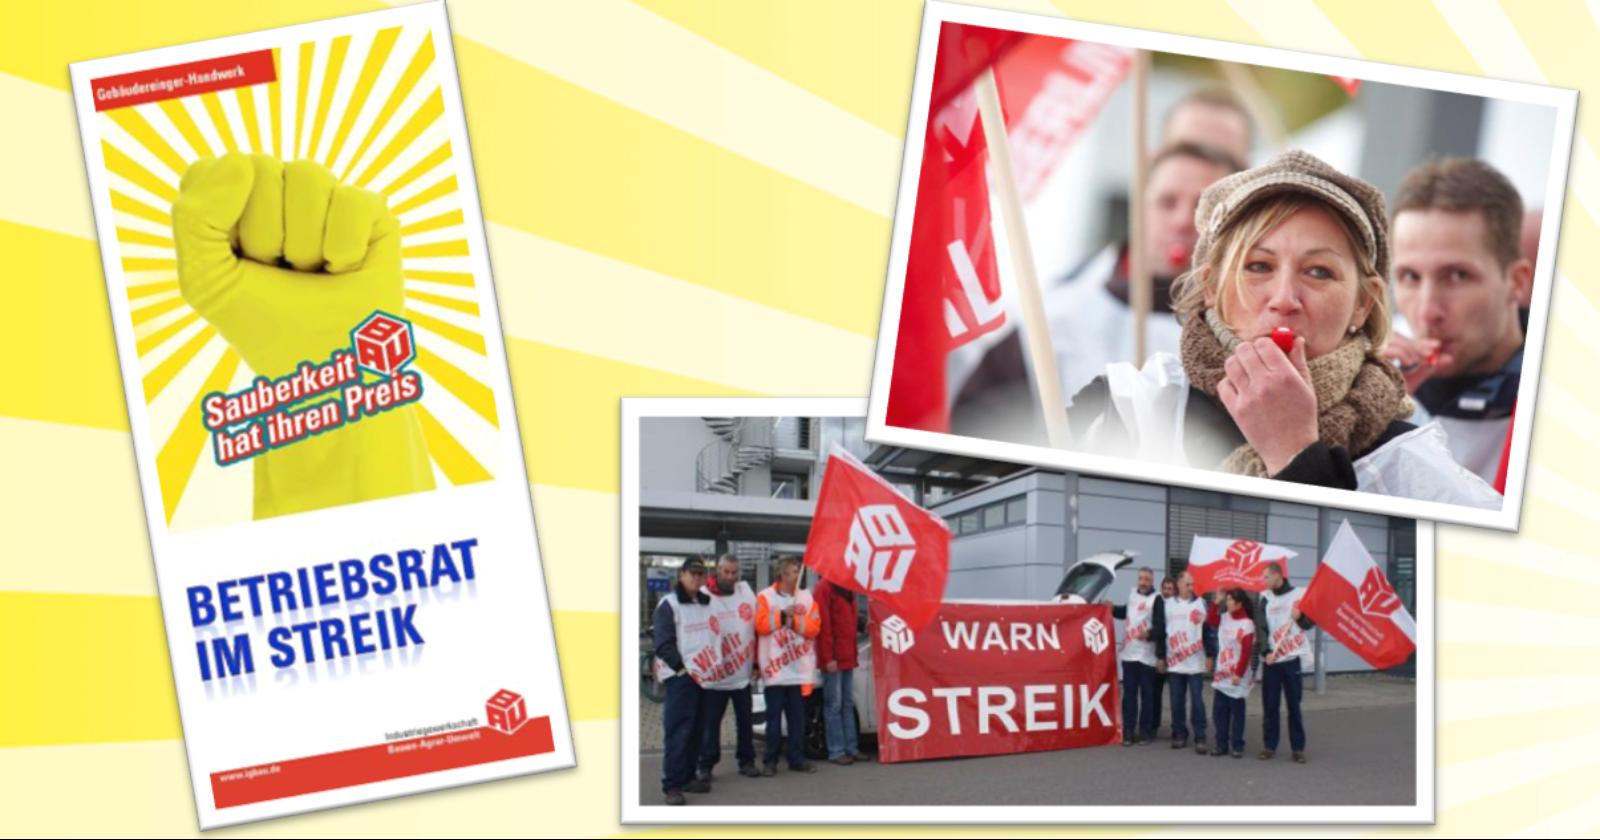 Faltblatt: Betriebsrat im Streik